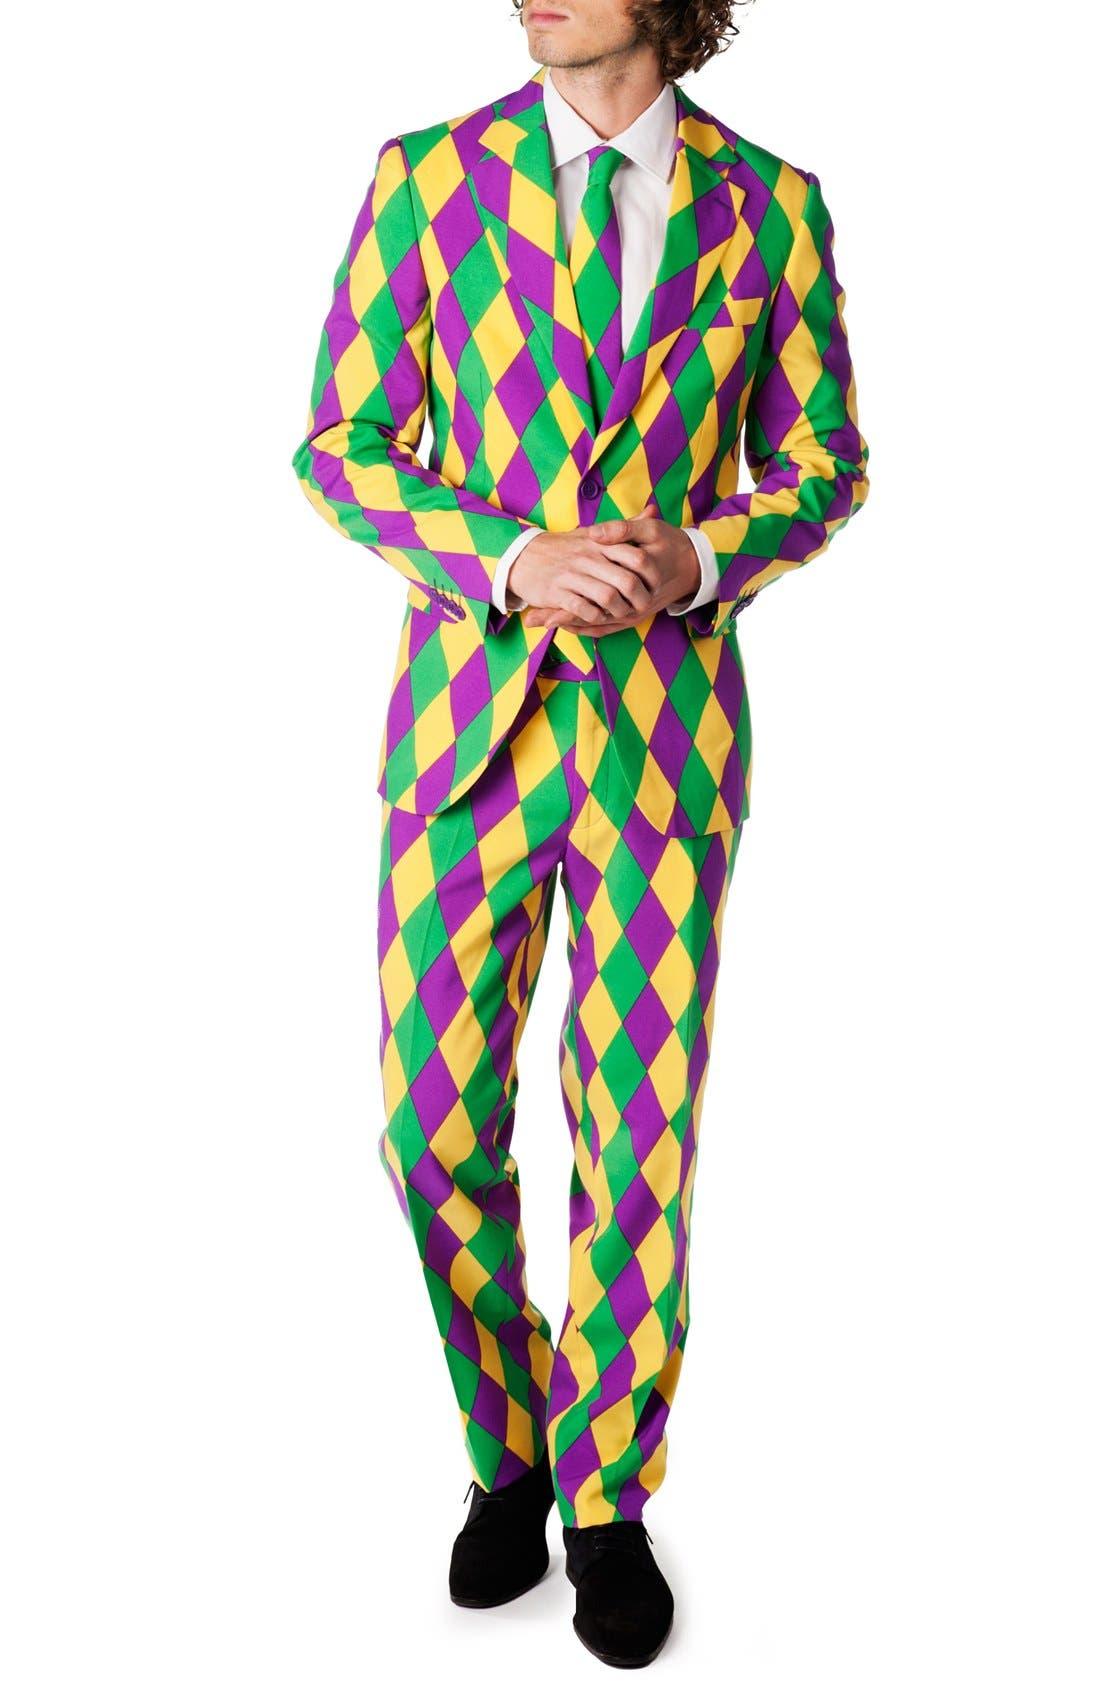 'Harleking' Trim Fit Suit with Tie,                         Main,                         color, 300